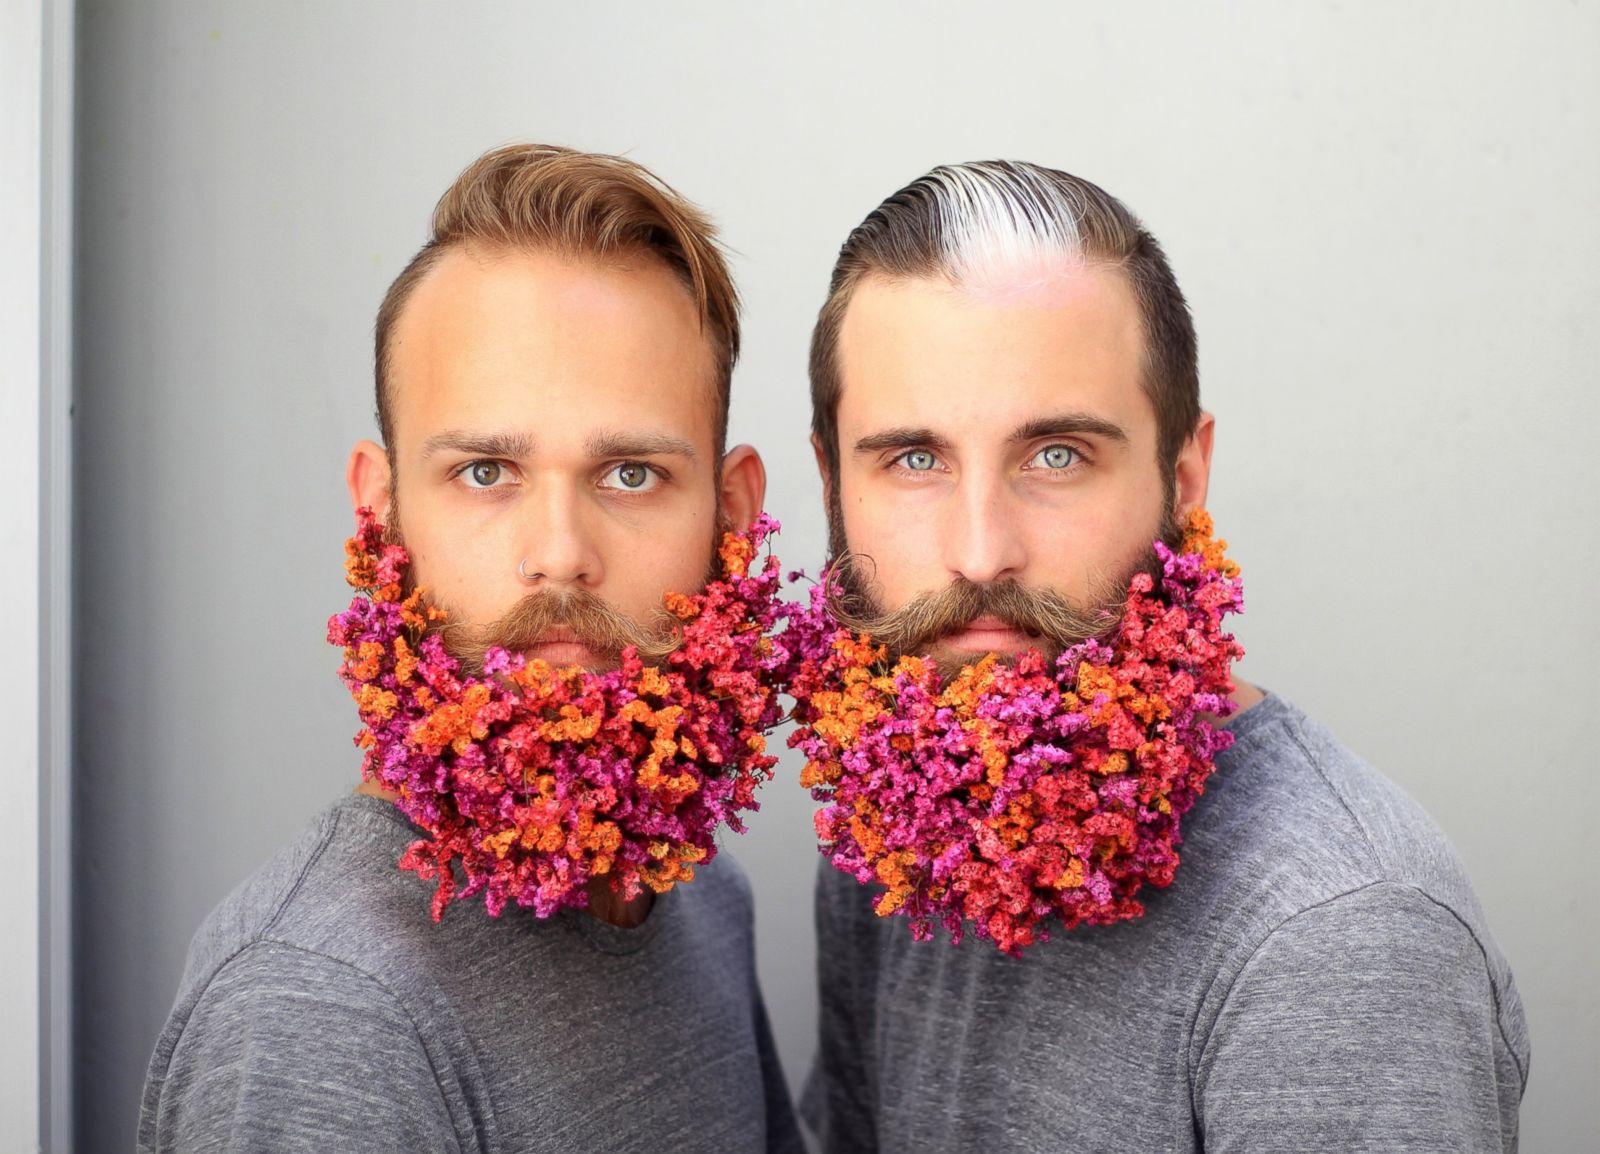 extreme beard grooming photos image 7 abc news. Black Bedroom Furniture Sets. Home Design Ideas